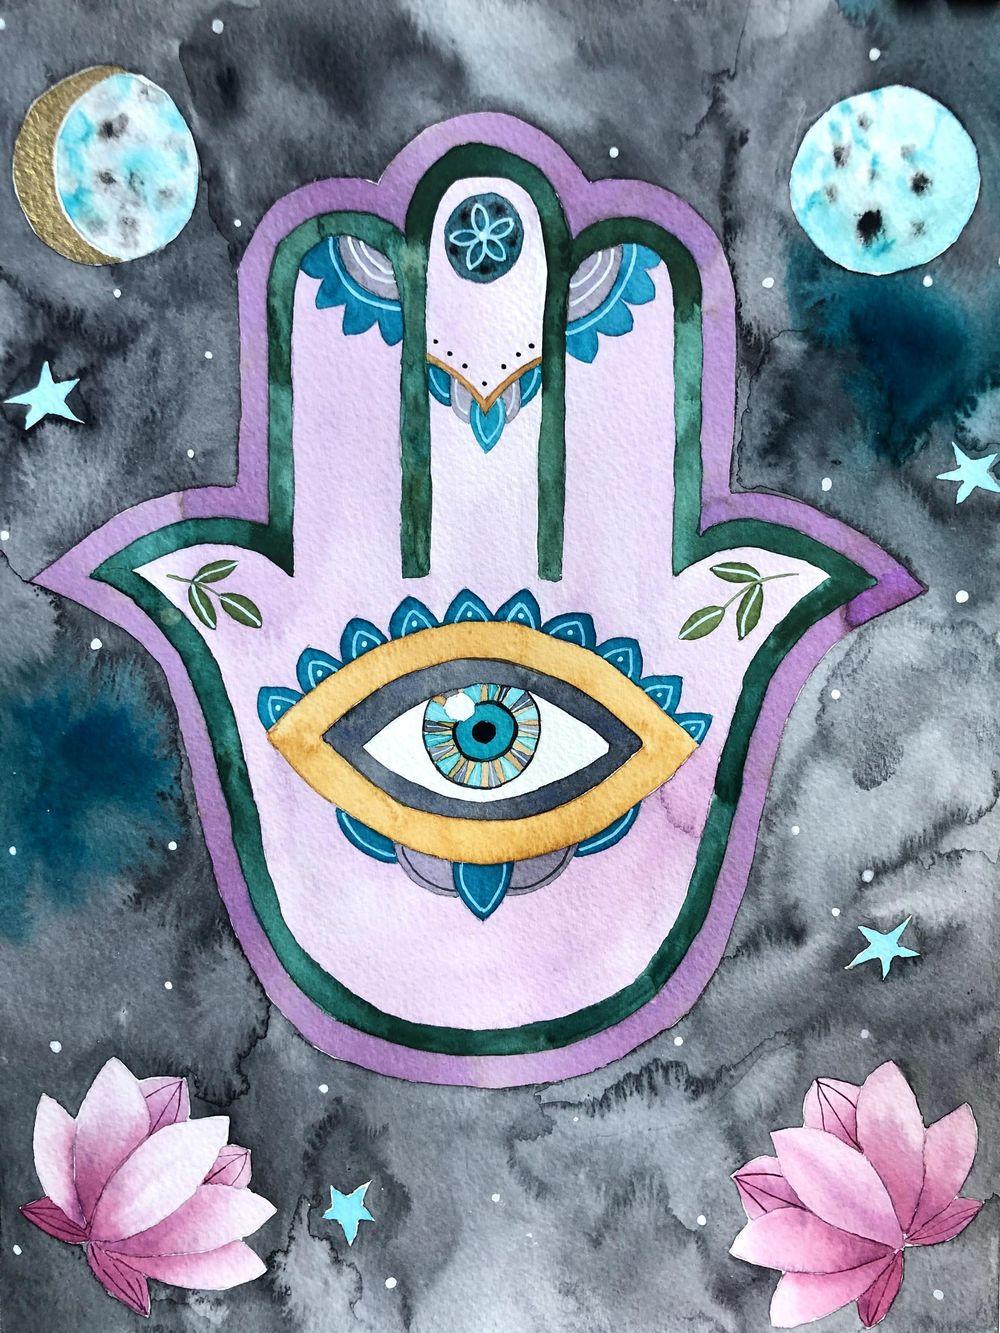 Hamsa hand - image 1 - student project